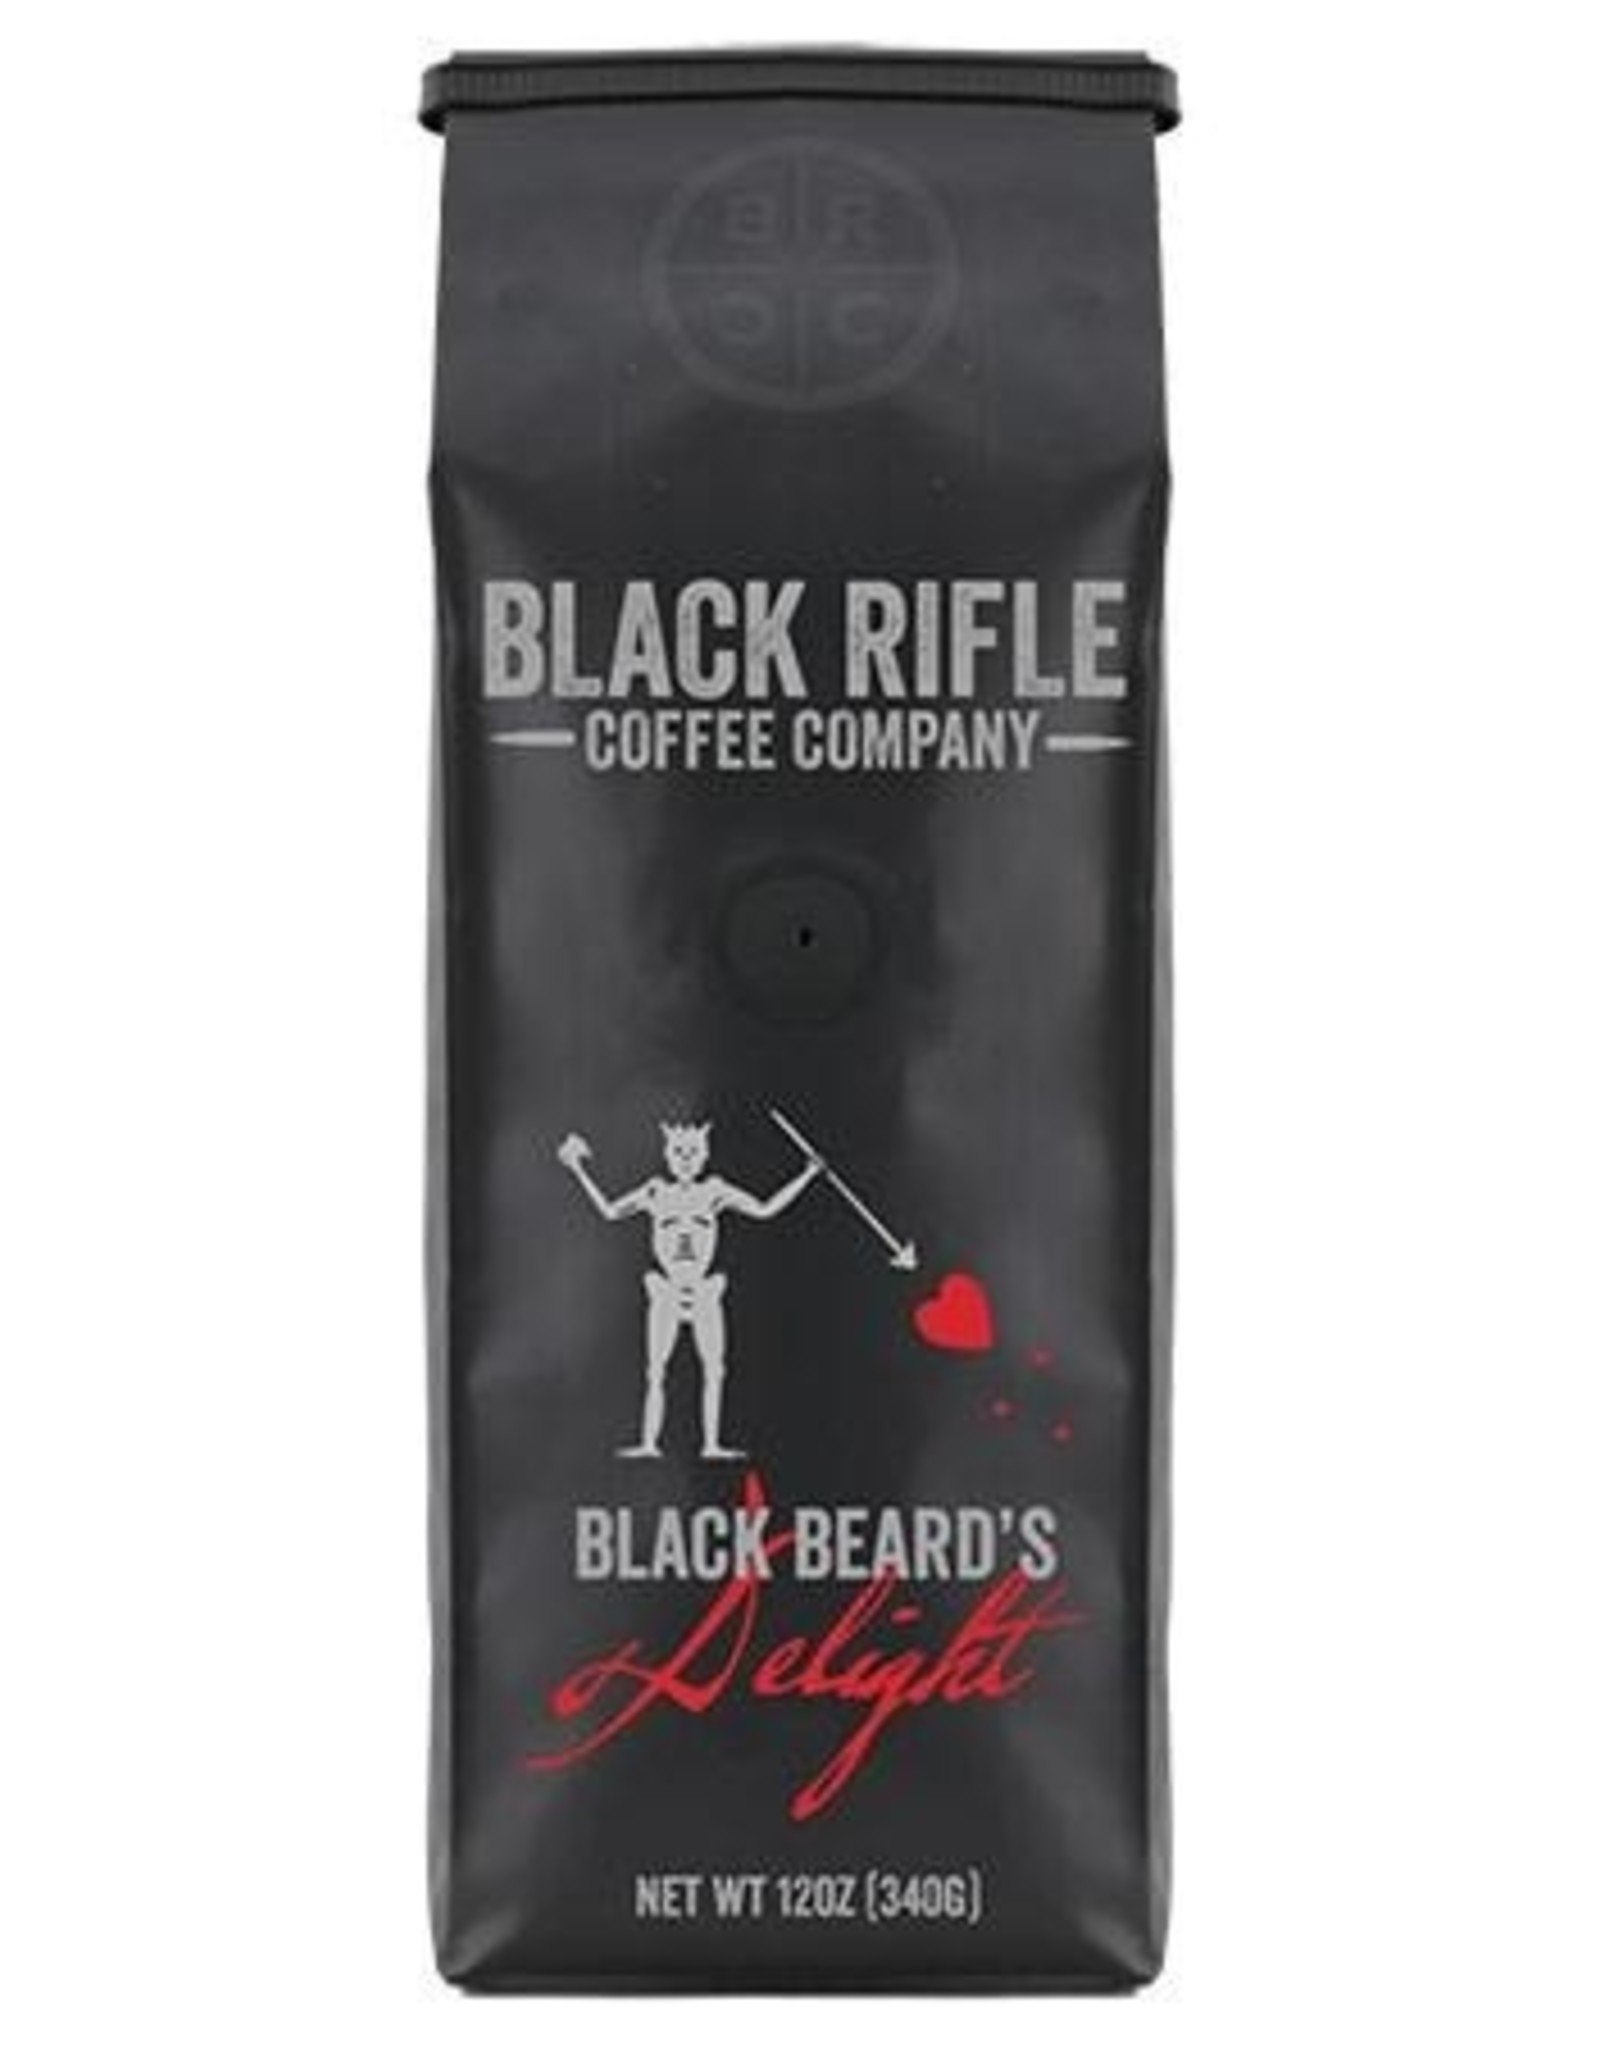 BLack Rifle Coffee Black Coffee Rifle Black Beard's Delight Blend Whole Bean